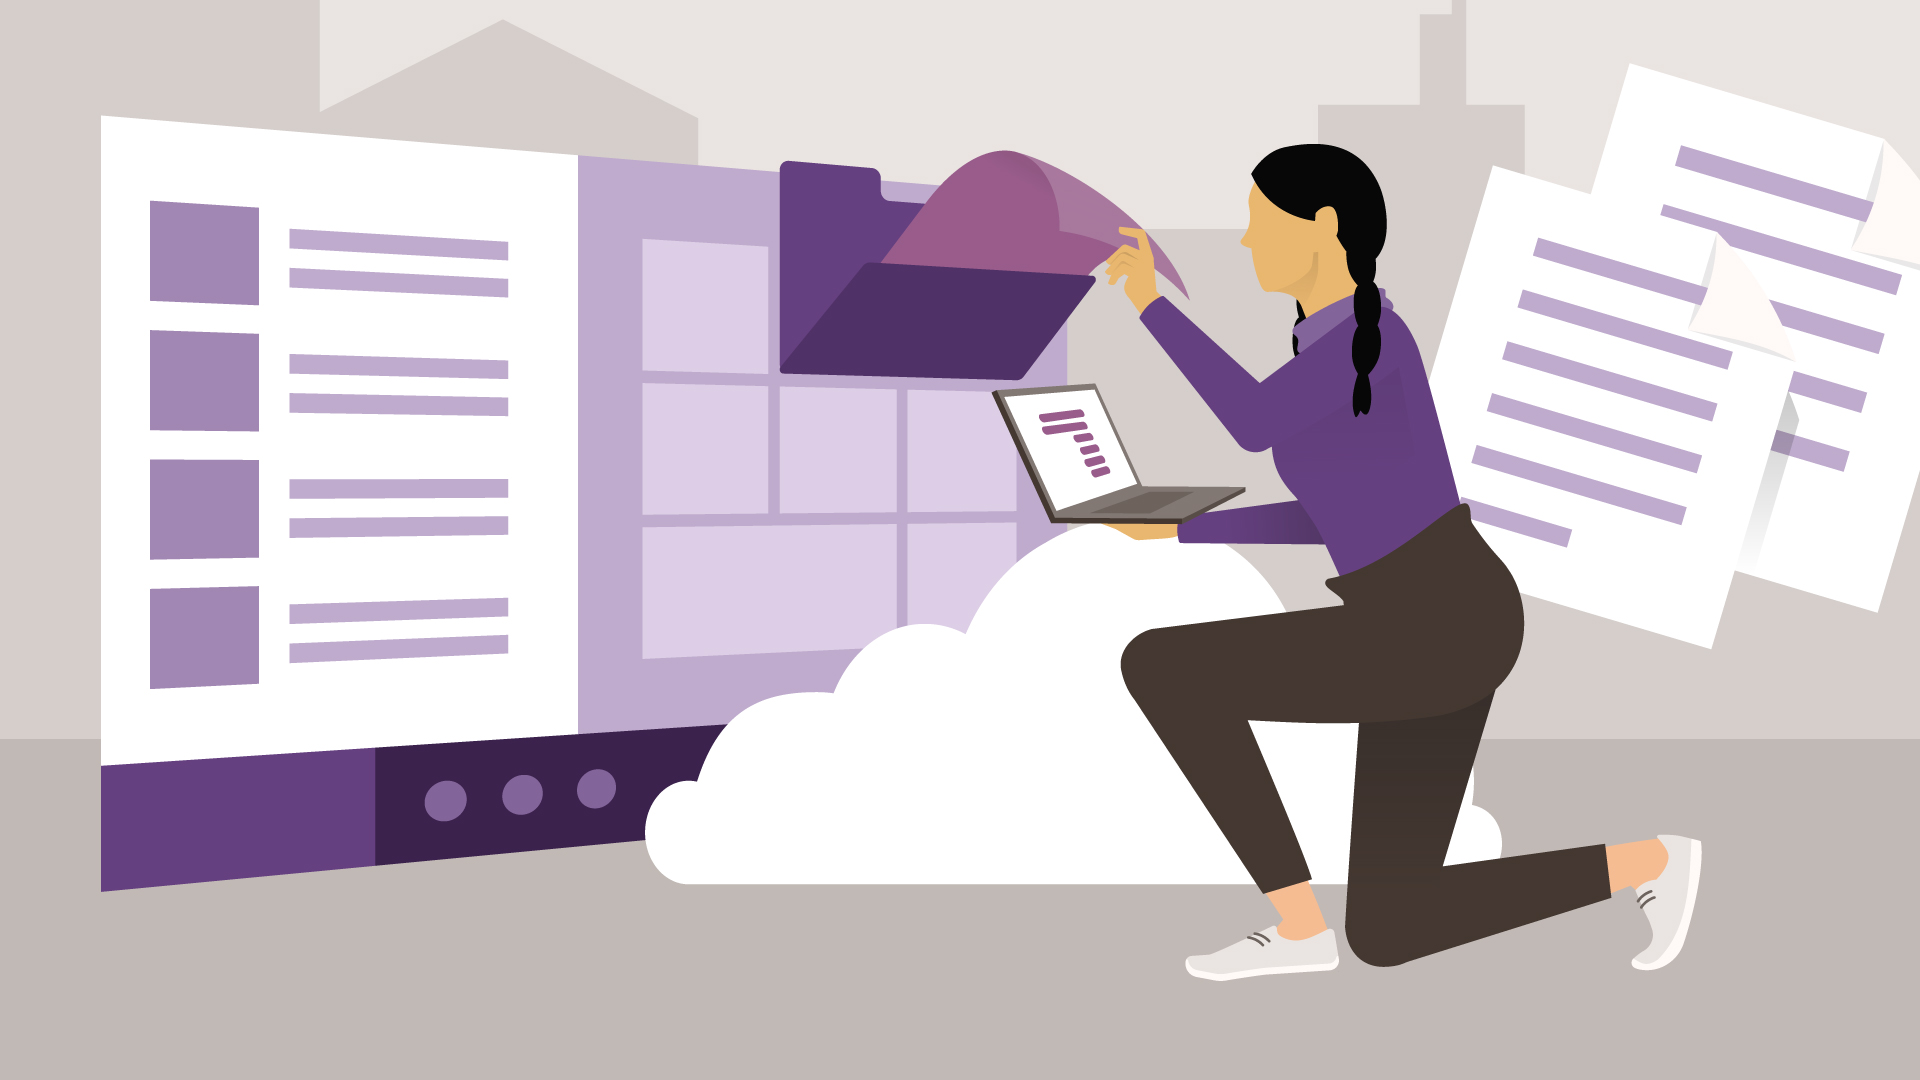 Descubra o OneDrive for Business